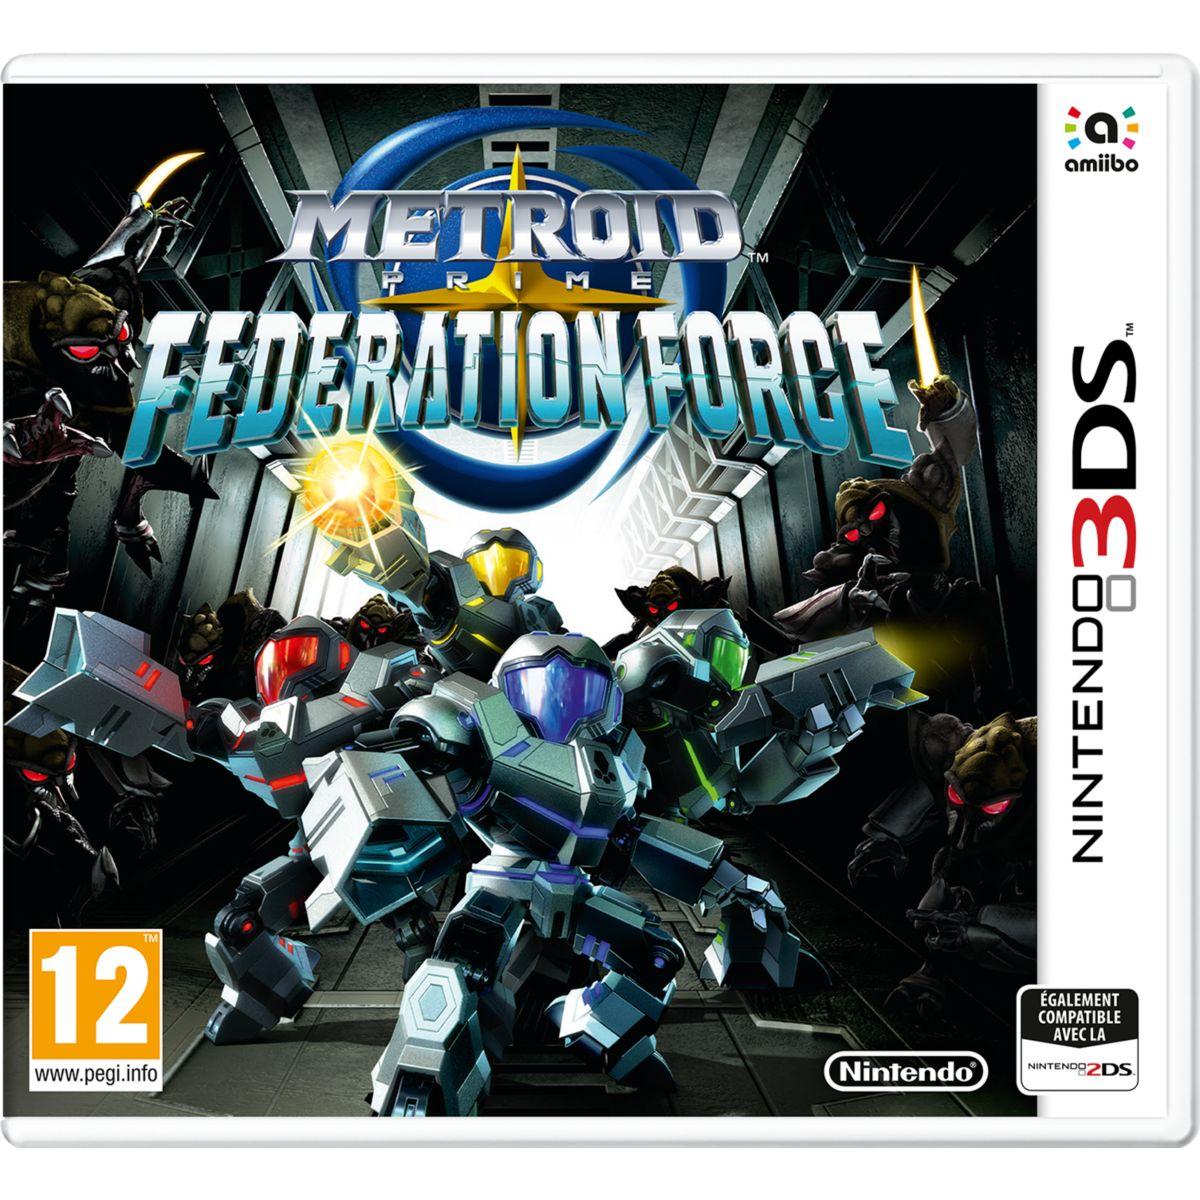 Jeu 3DS NINTENDO Metroid Prime Federation Force (photo)